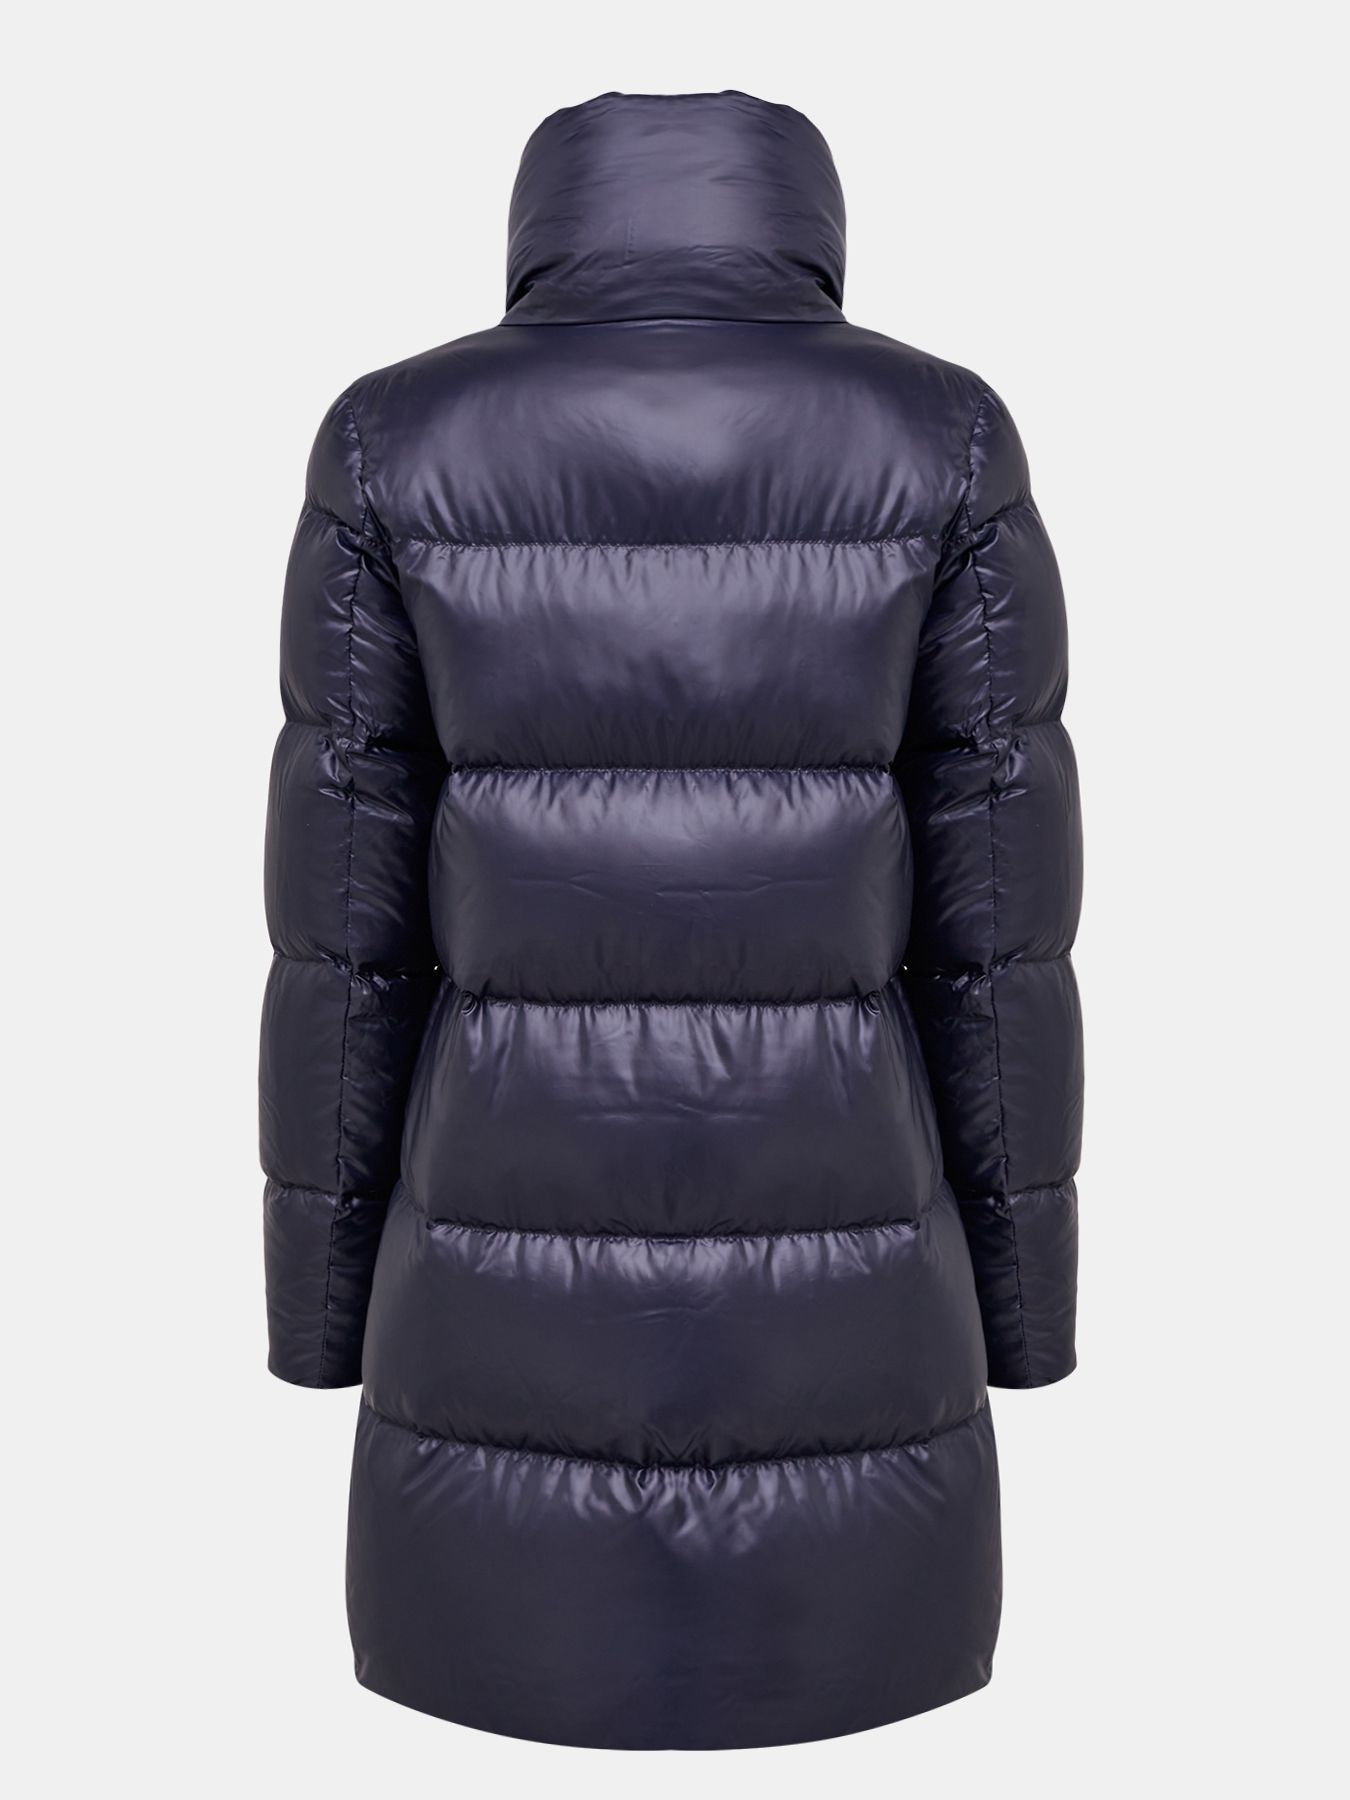 Пальто Alessandro Manzoni Пуховик пуховик baon baon ba007ewhbfc6